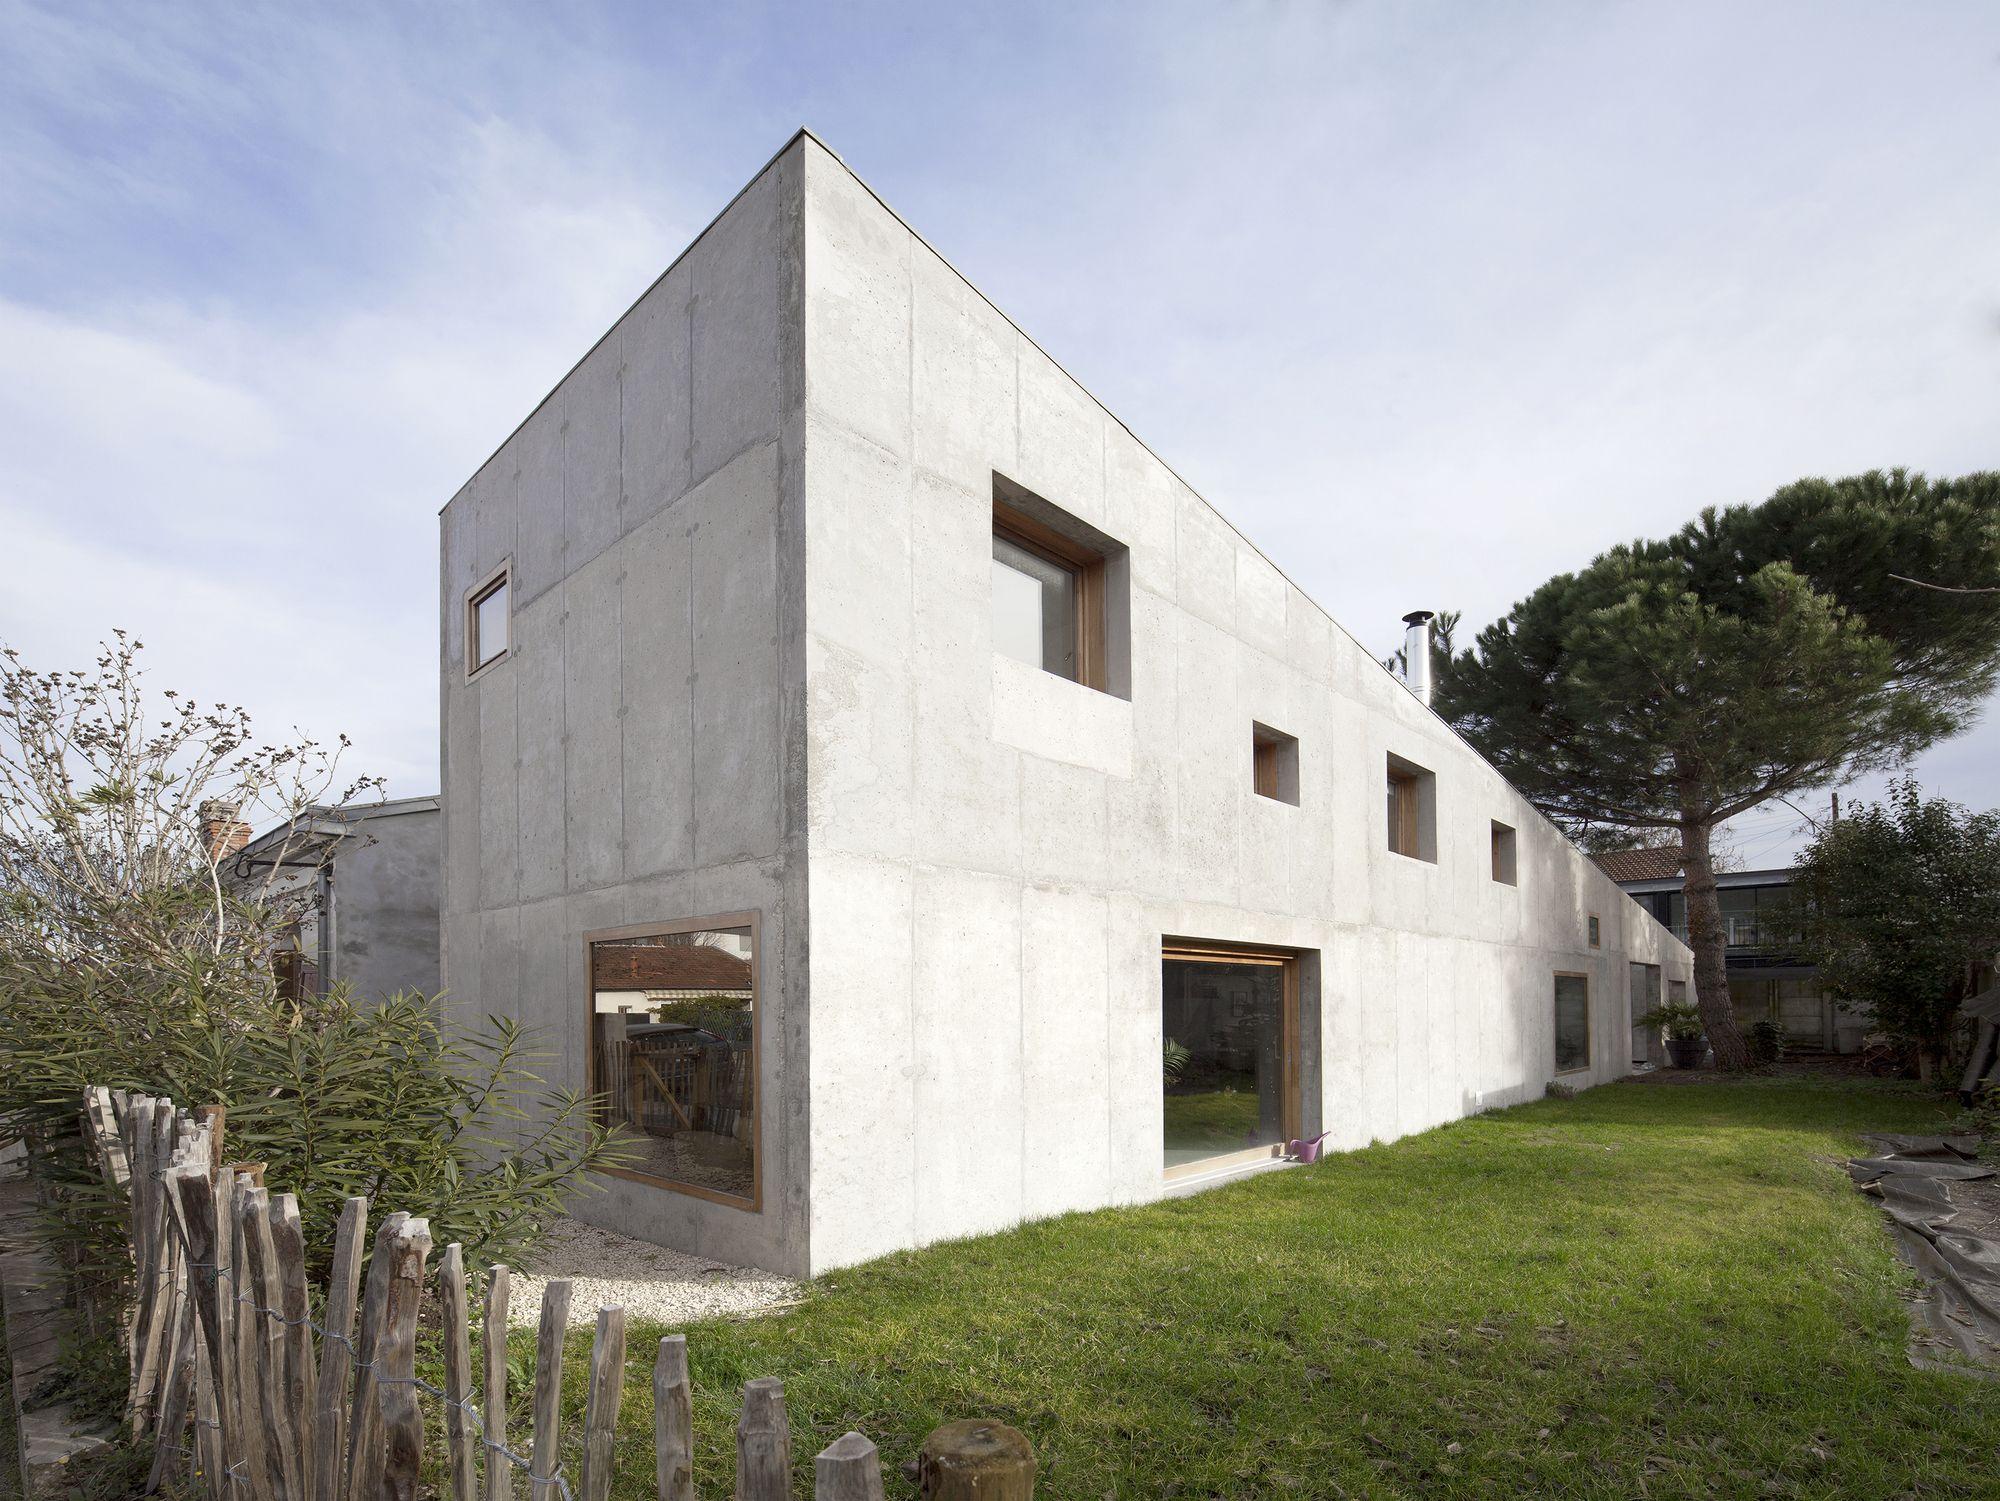 Aly House More Architecture Architecture Concrete Facade House